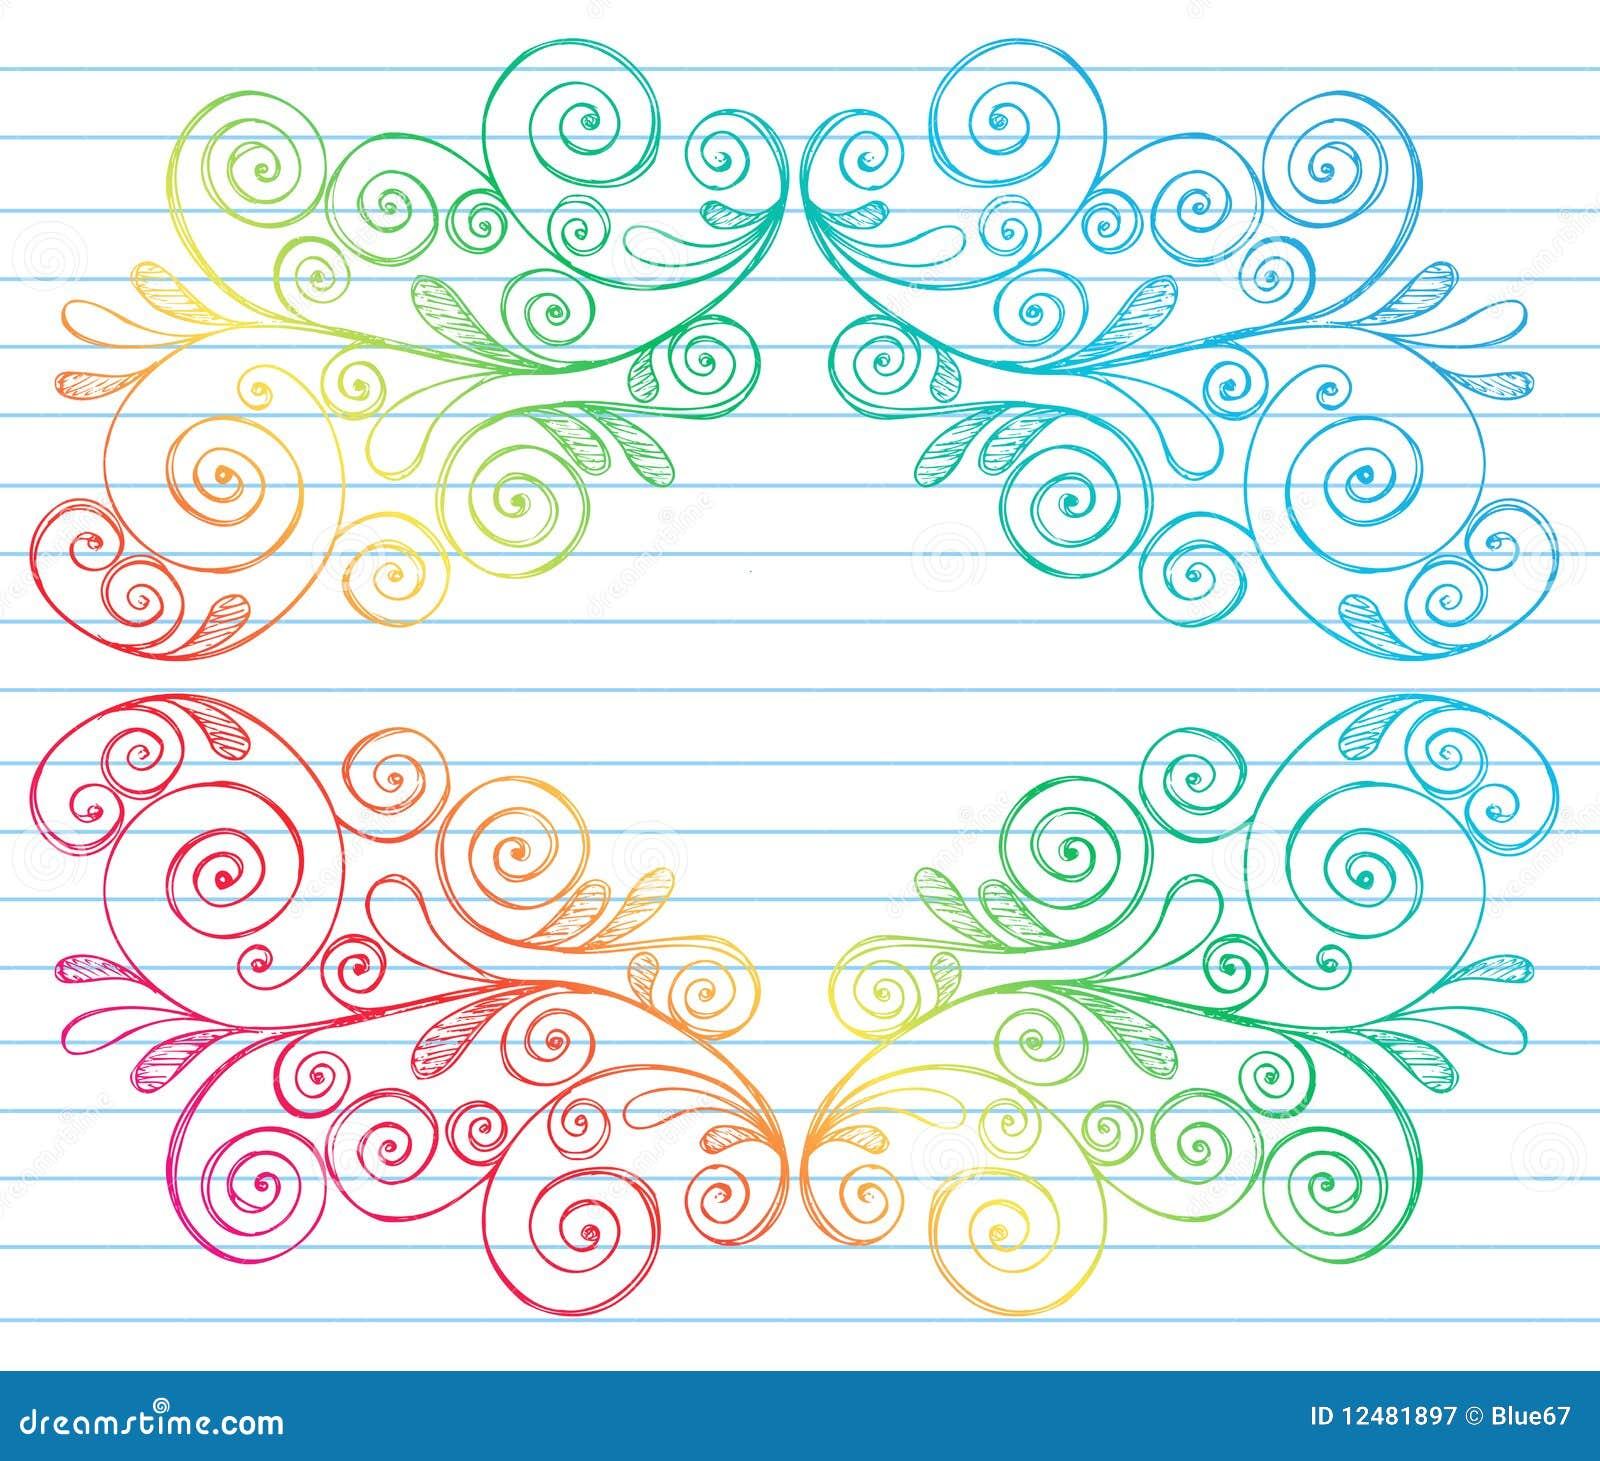 Sketchy Notebook Doodles Swirls Vines Border Stock Vector ...